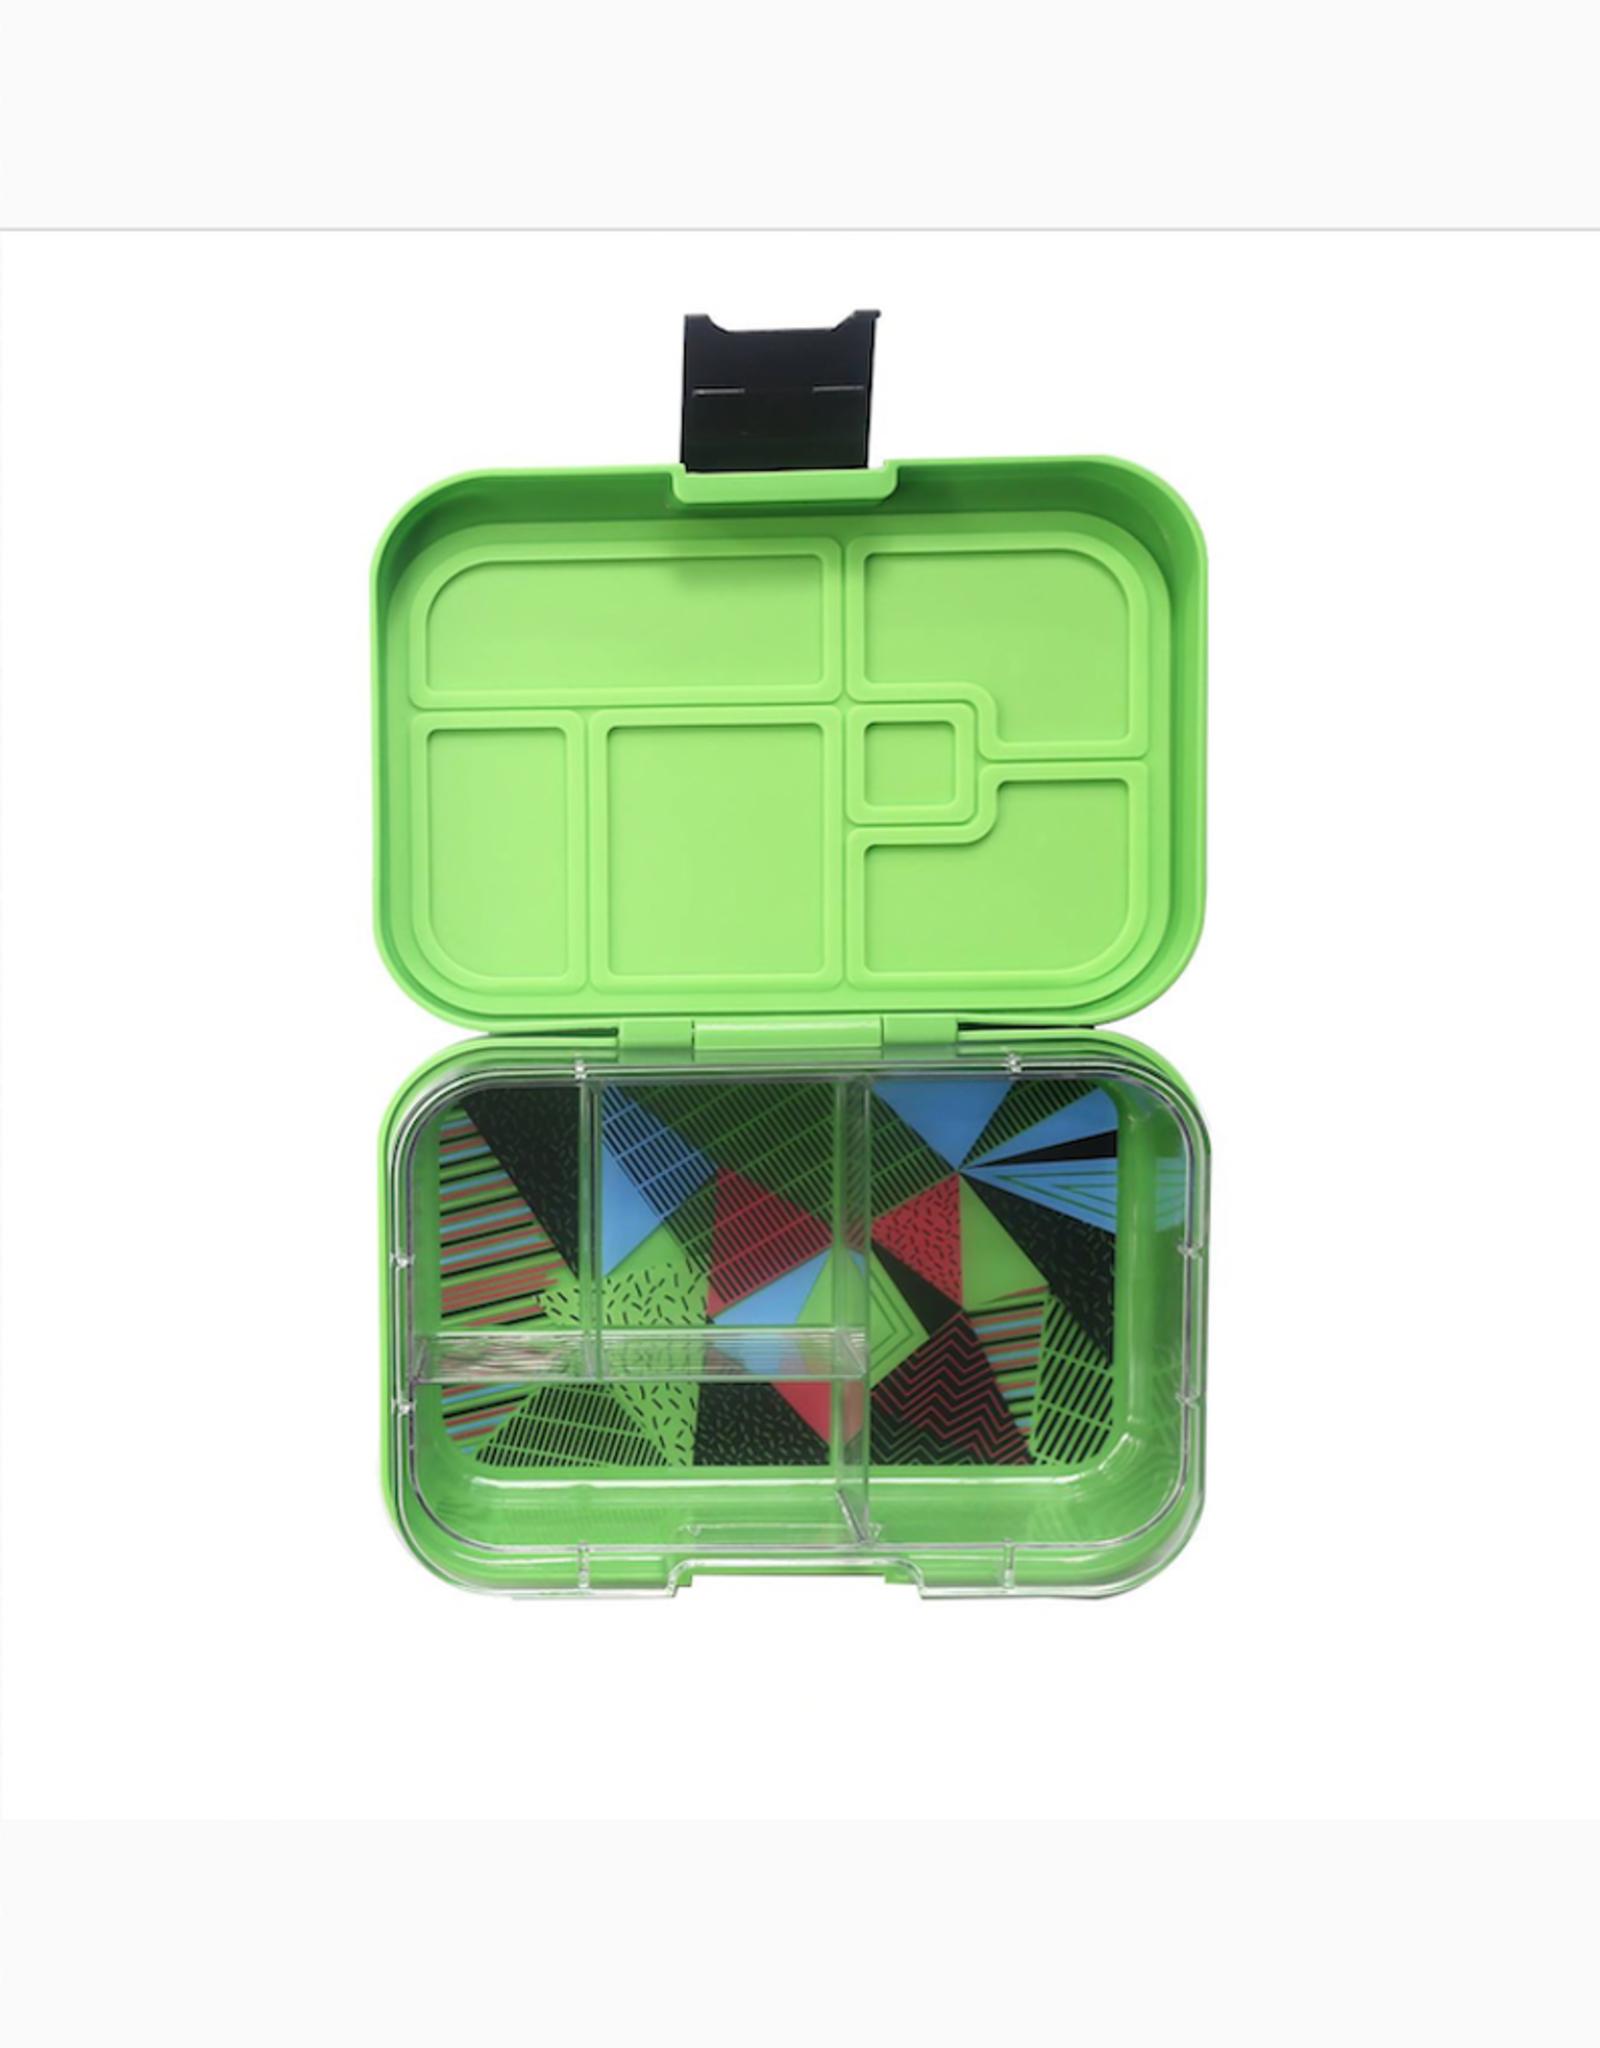 Munchbox Mega 4 Munchbox, #greenenvy